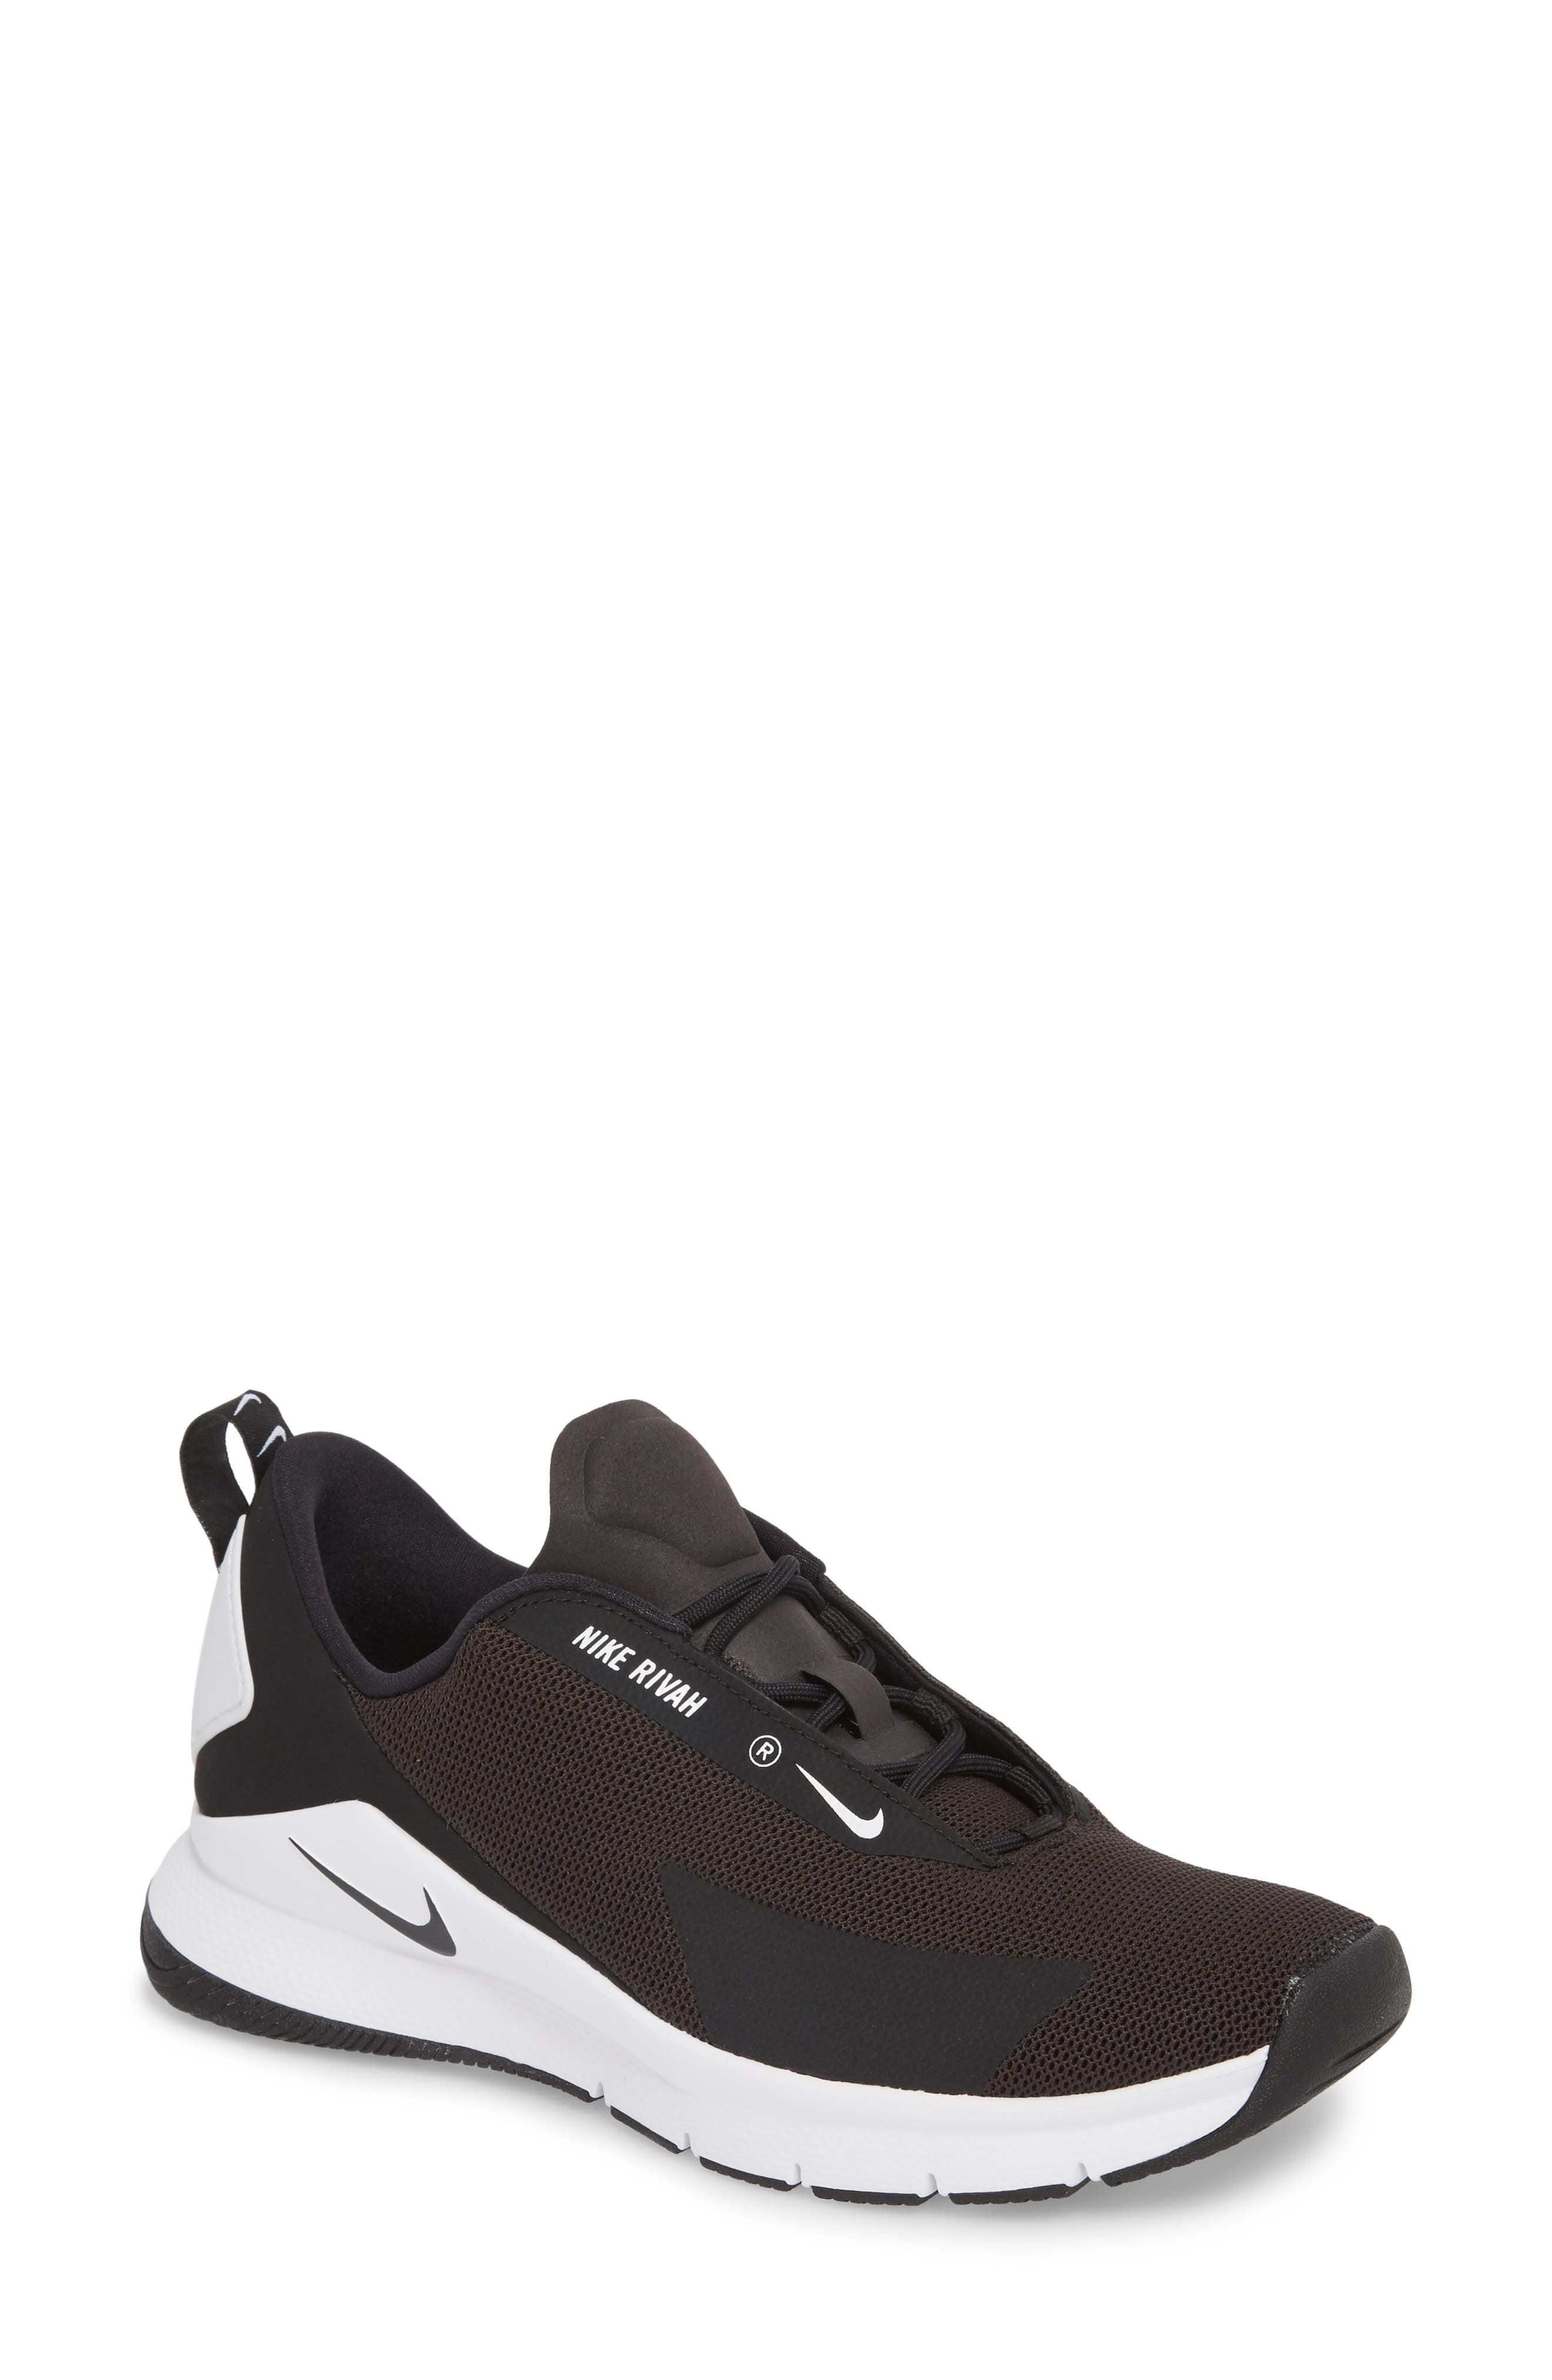 Nike | Rivah Sneaker | Nordstrom Rack